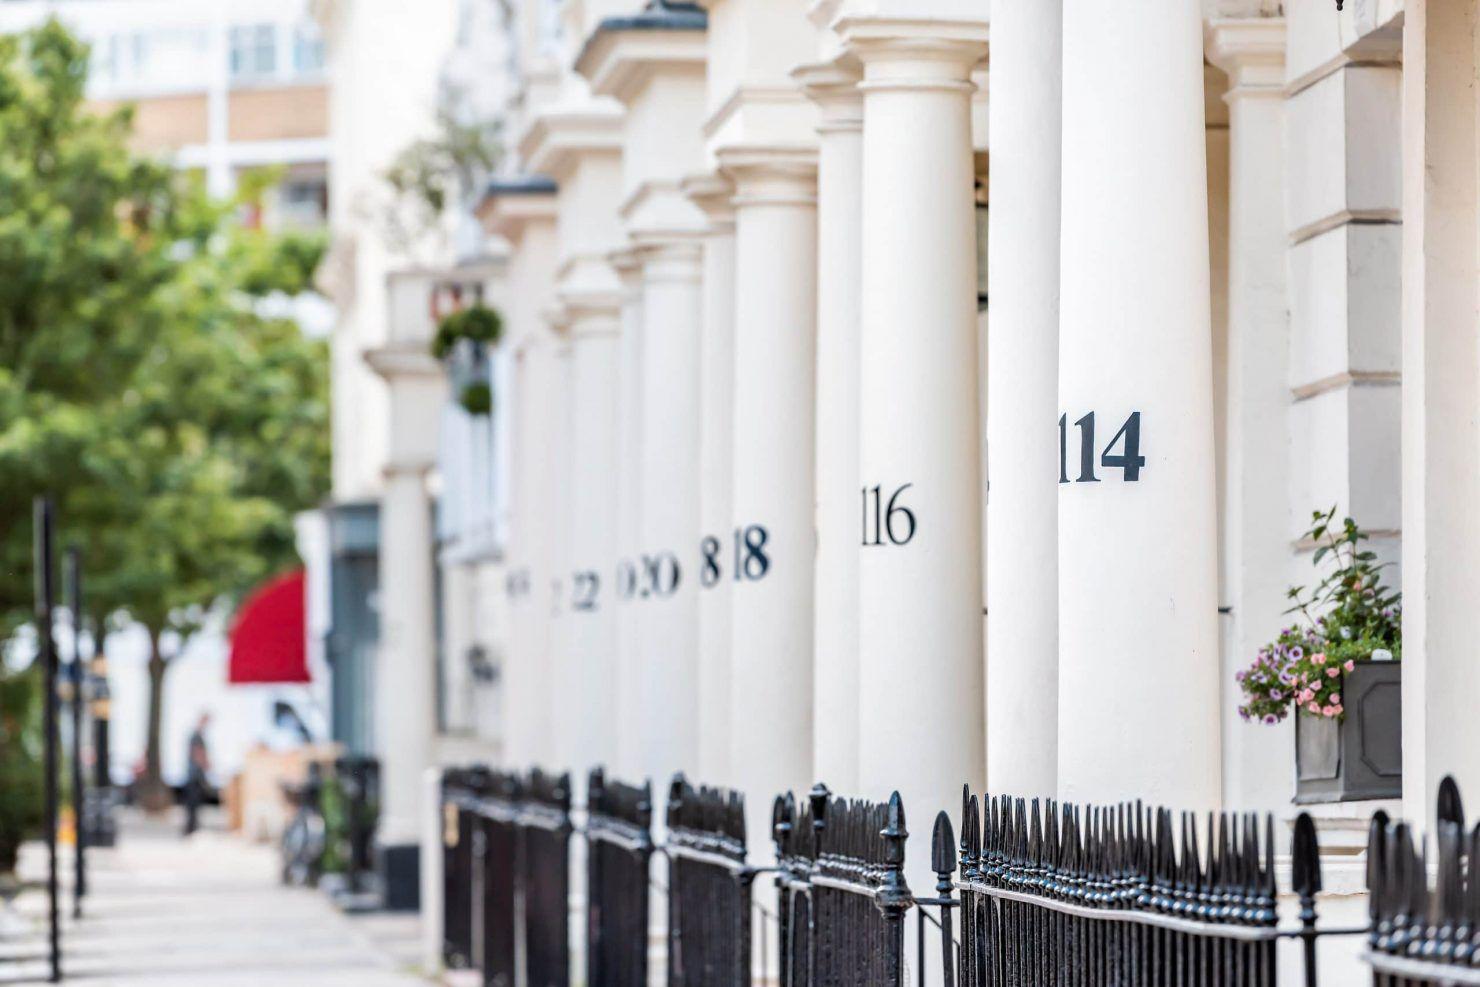 London neighborhood district of Pimlico